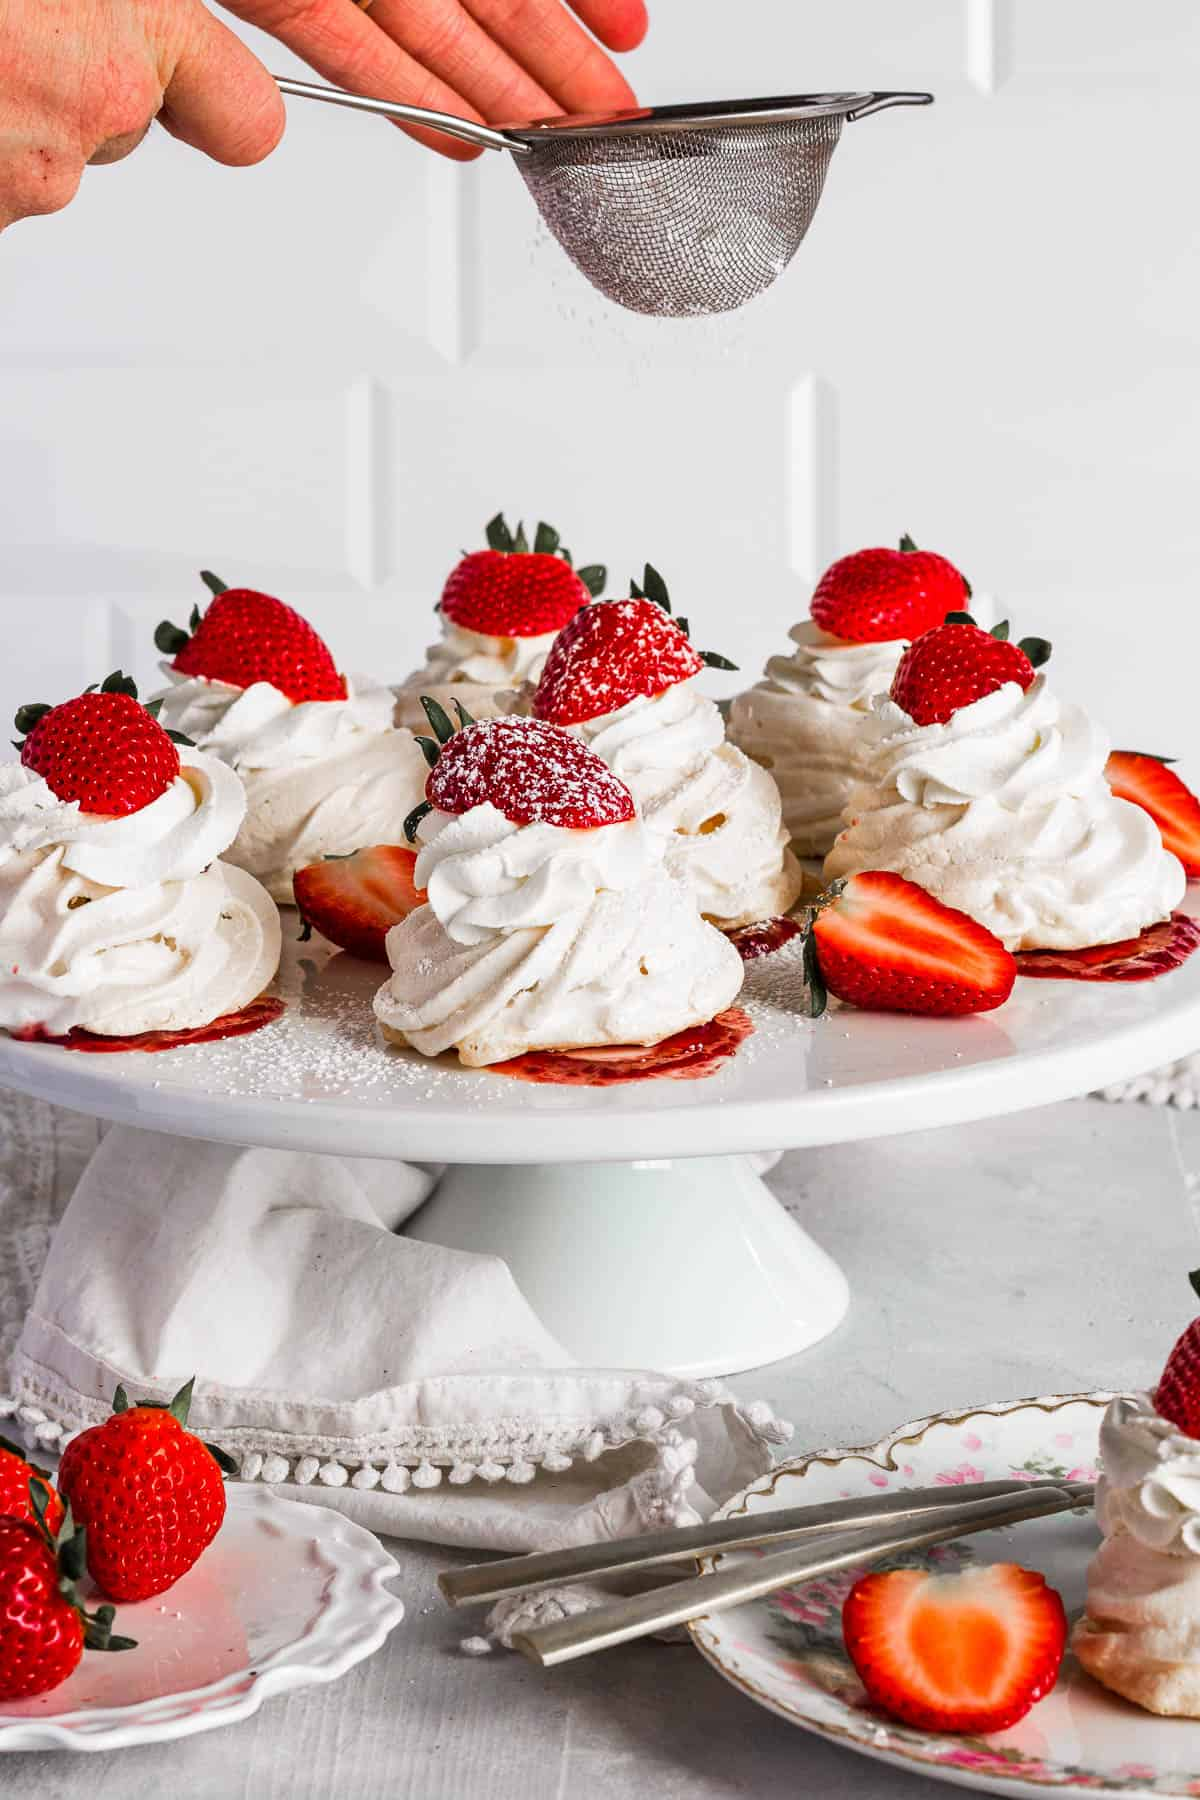 Sifting confectioners sugar onto pavlovas